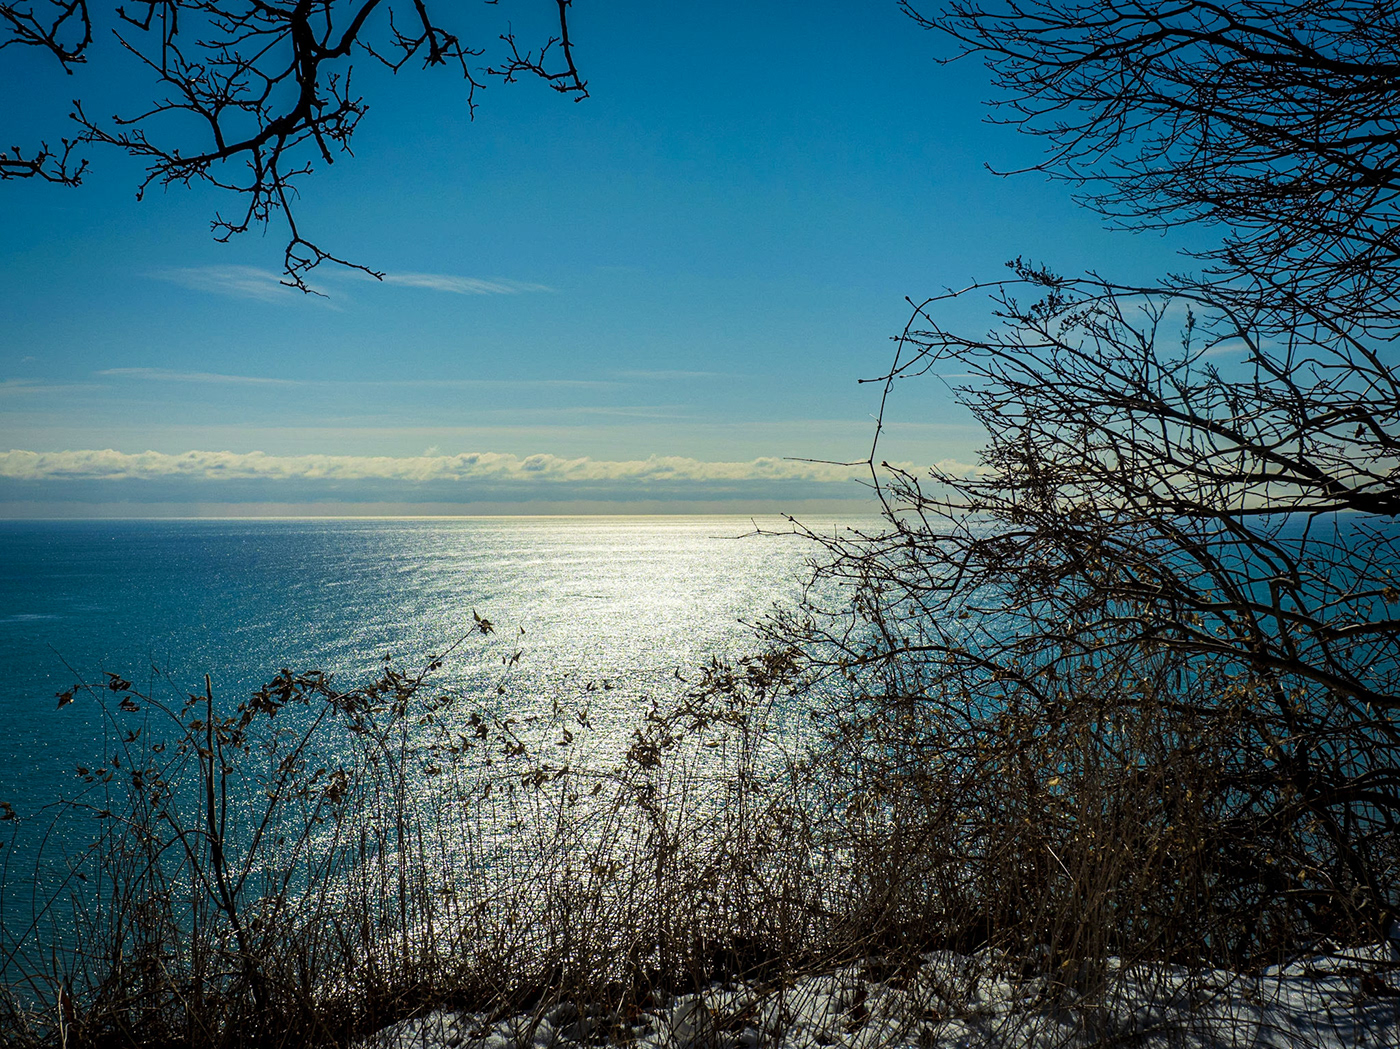 garden Lake Ontario Park photo walk Rosetta McClain Garden Scarborough Bluffs winter